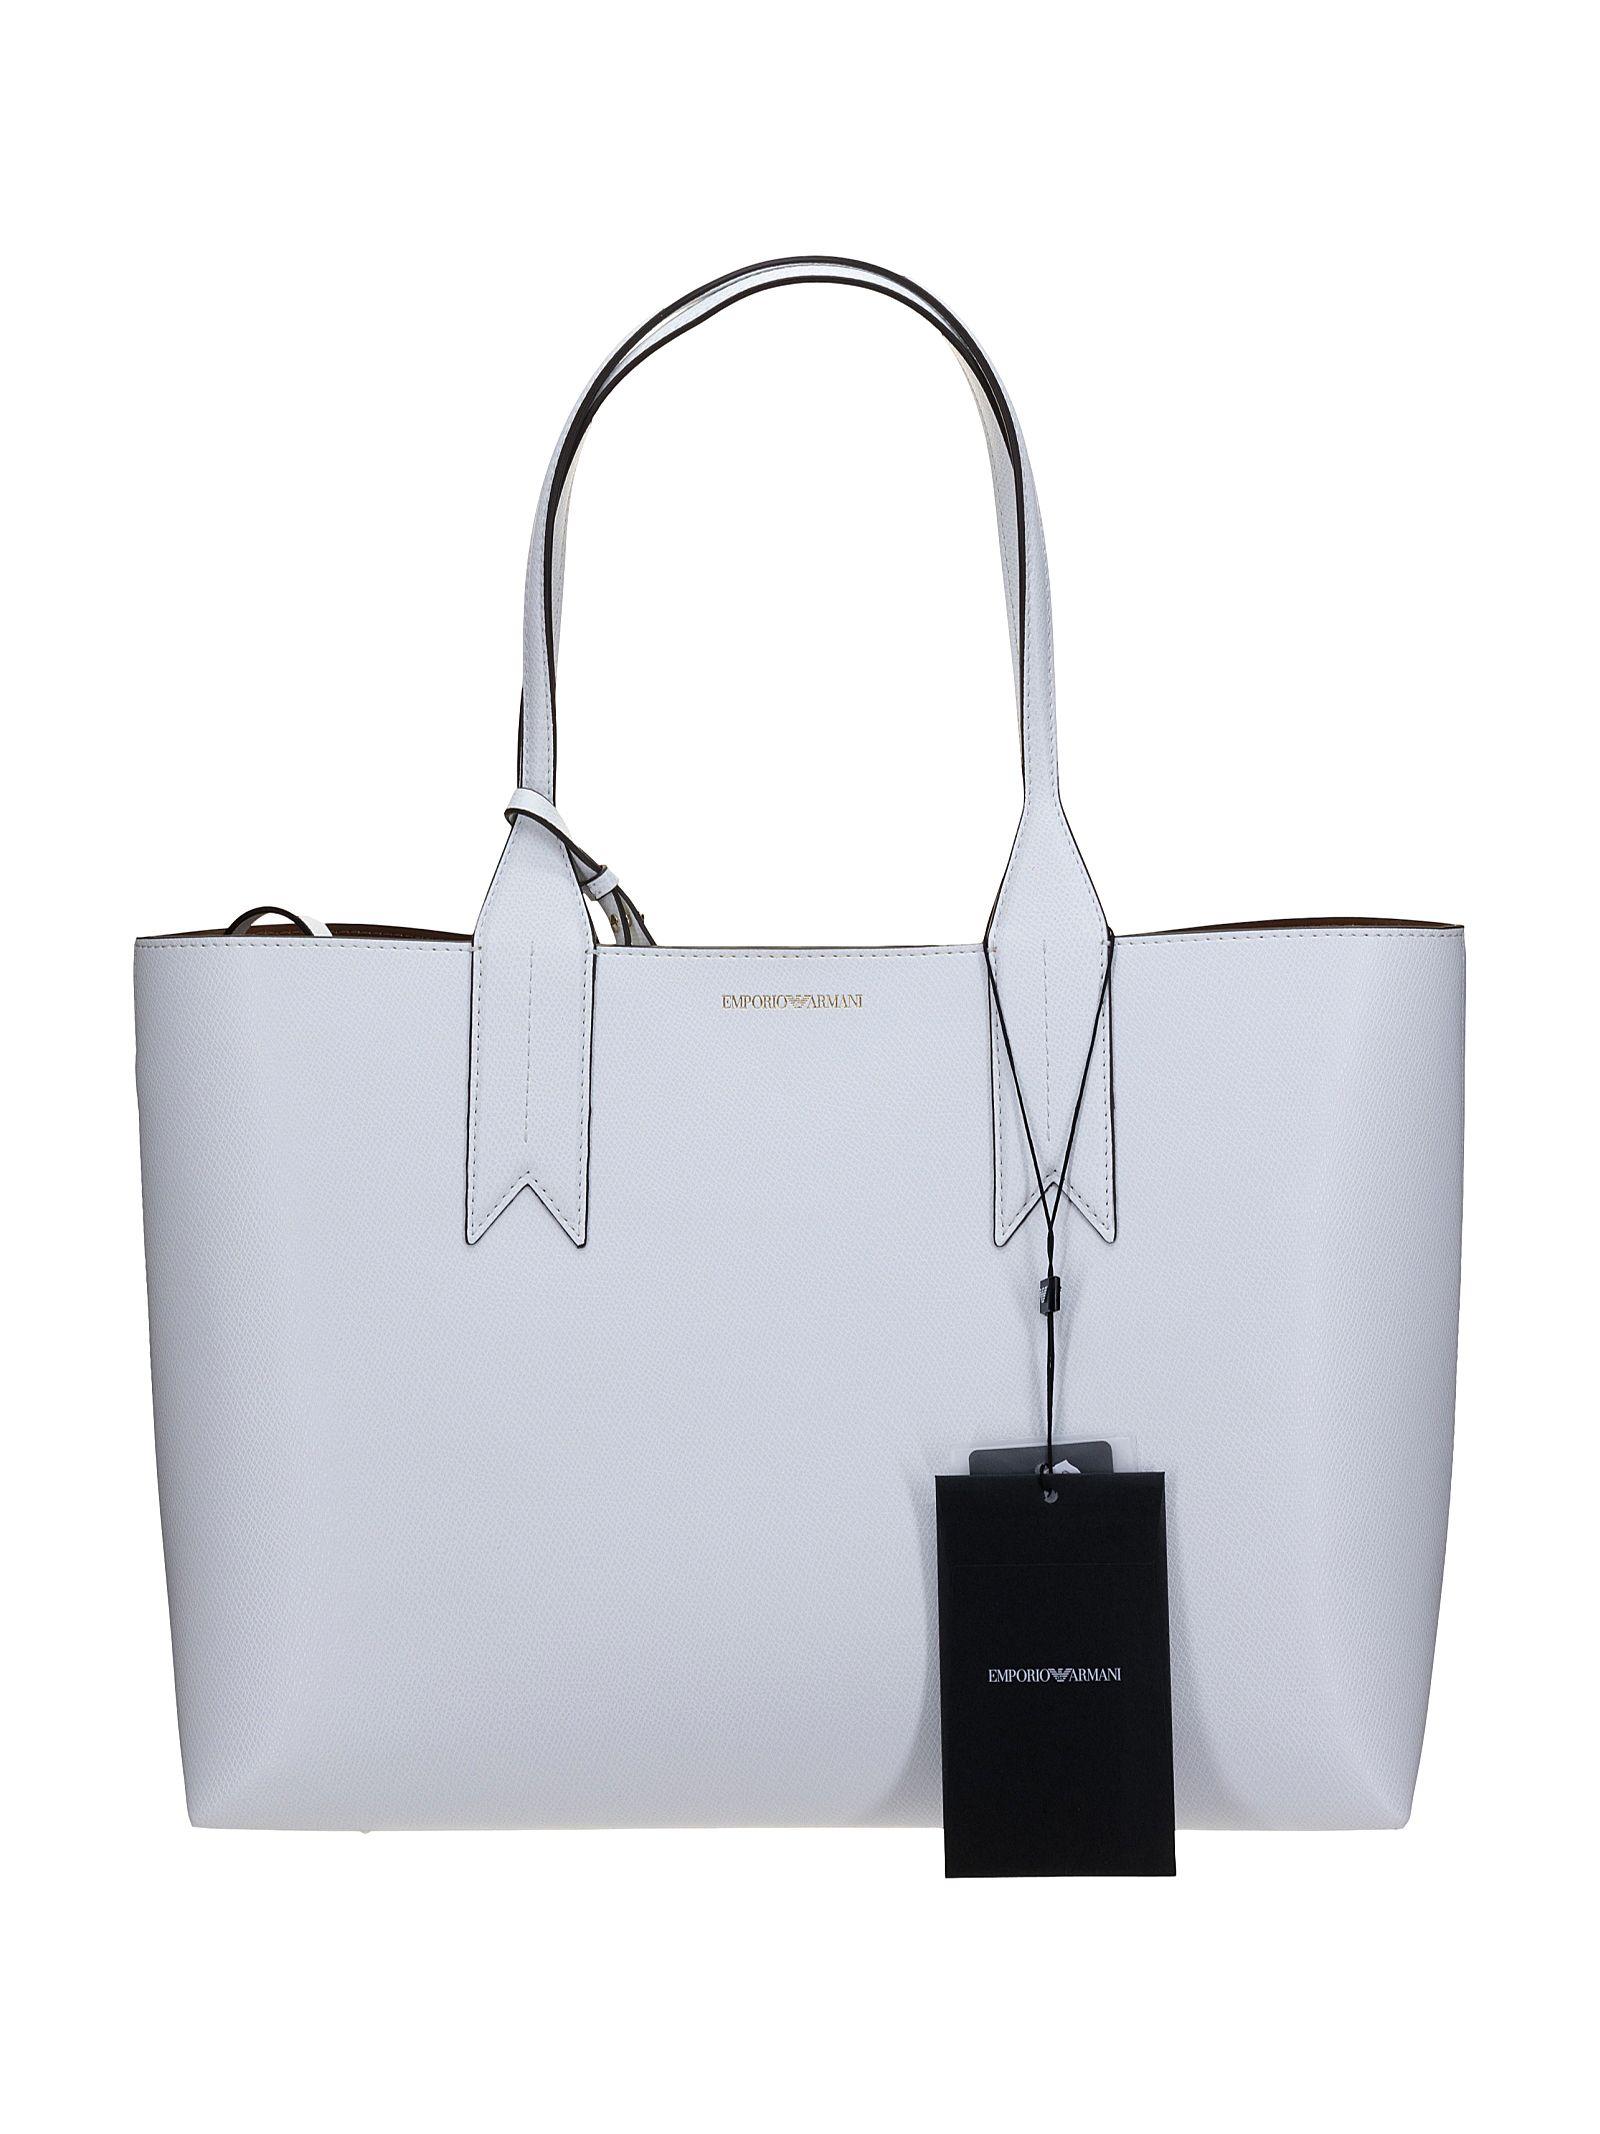 Emporio Armani Shopping Bianca